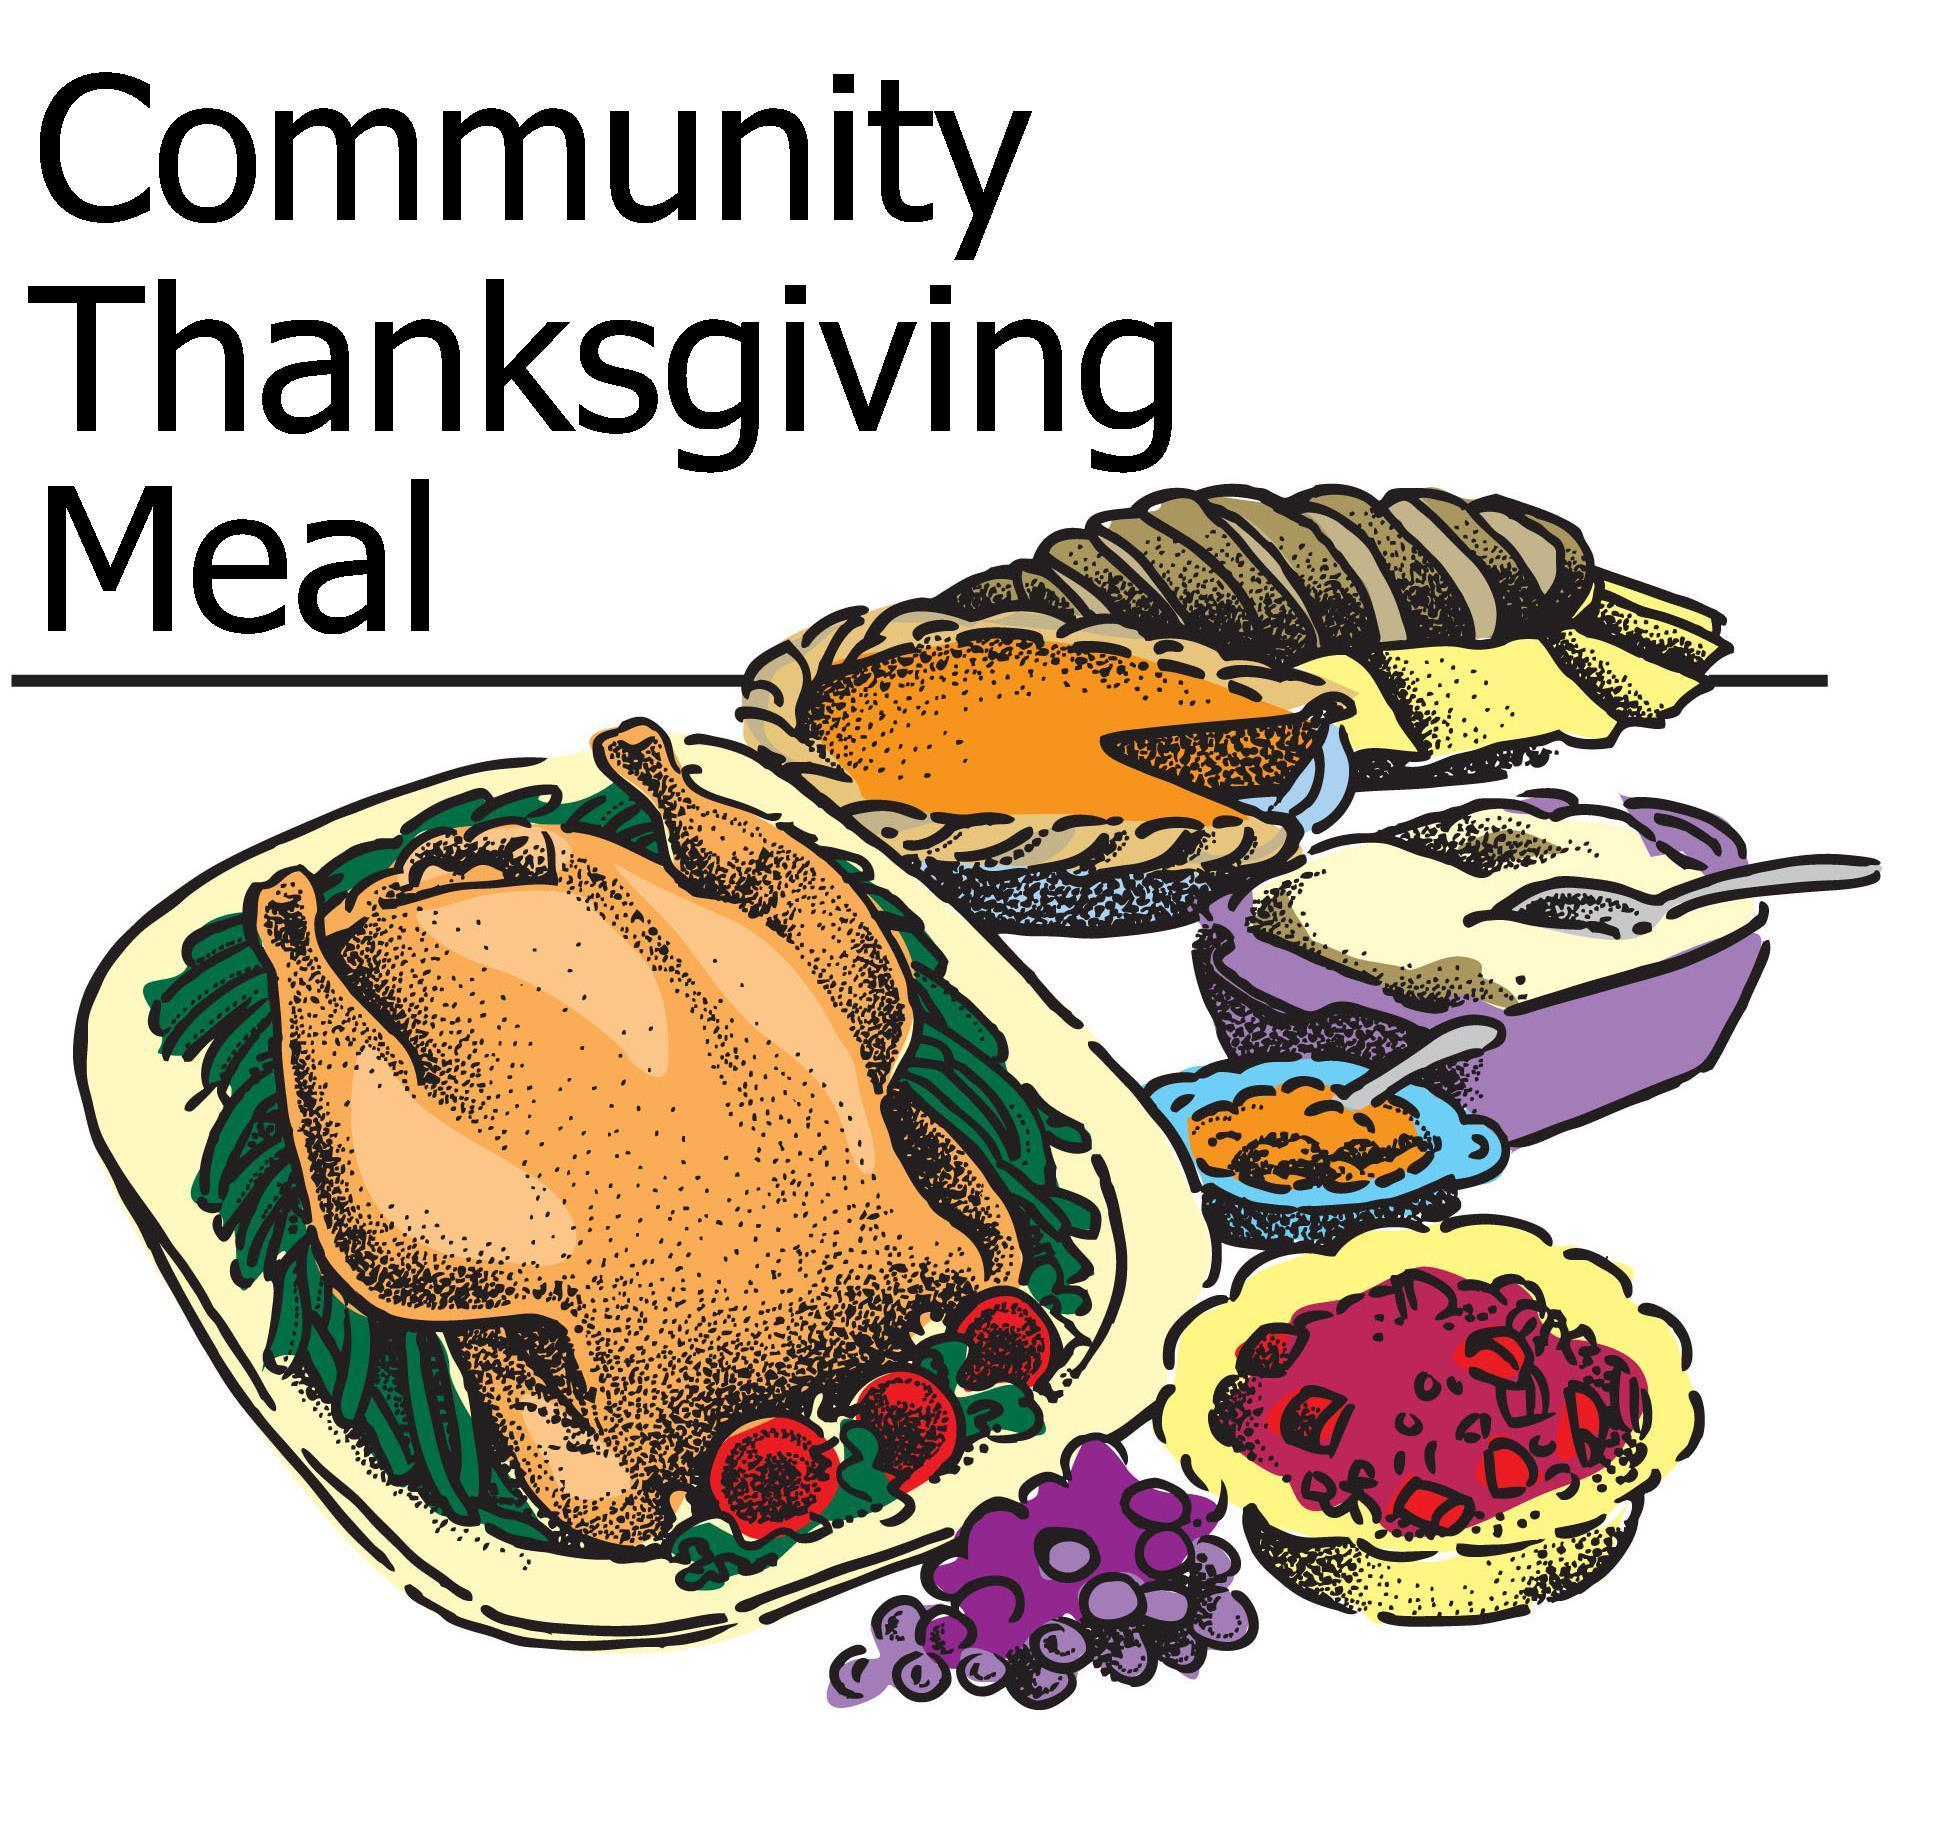 Community Thanksgiving Meal (2).jpg